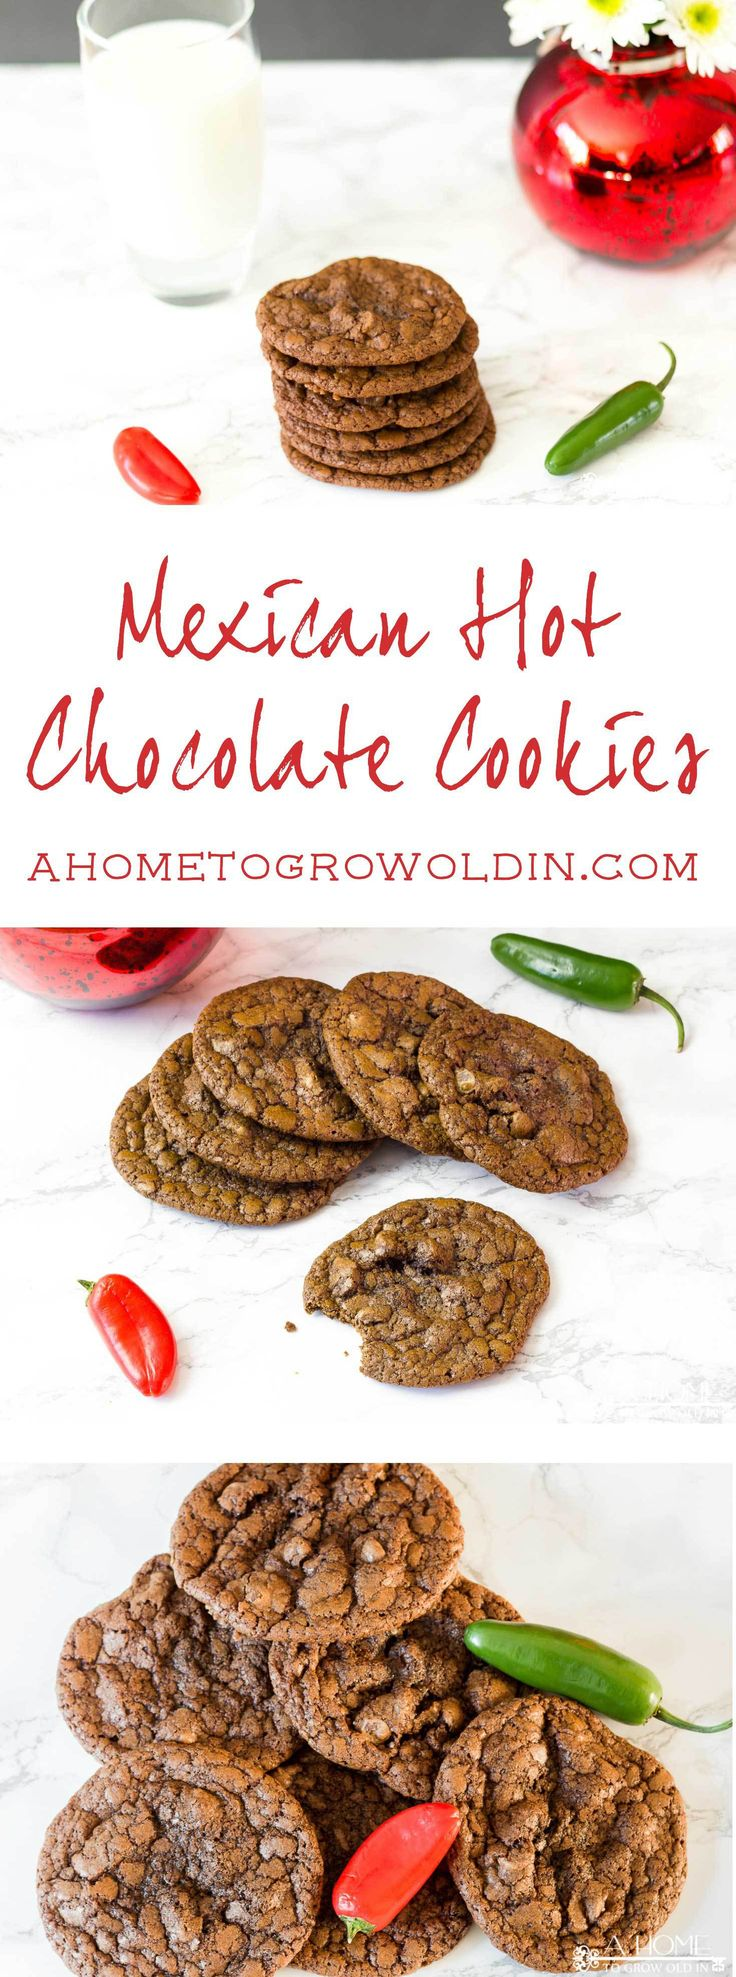 Best 25+ Love chocolate ideas on Pinterest   Choco chocolate ...